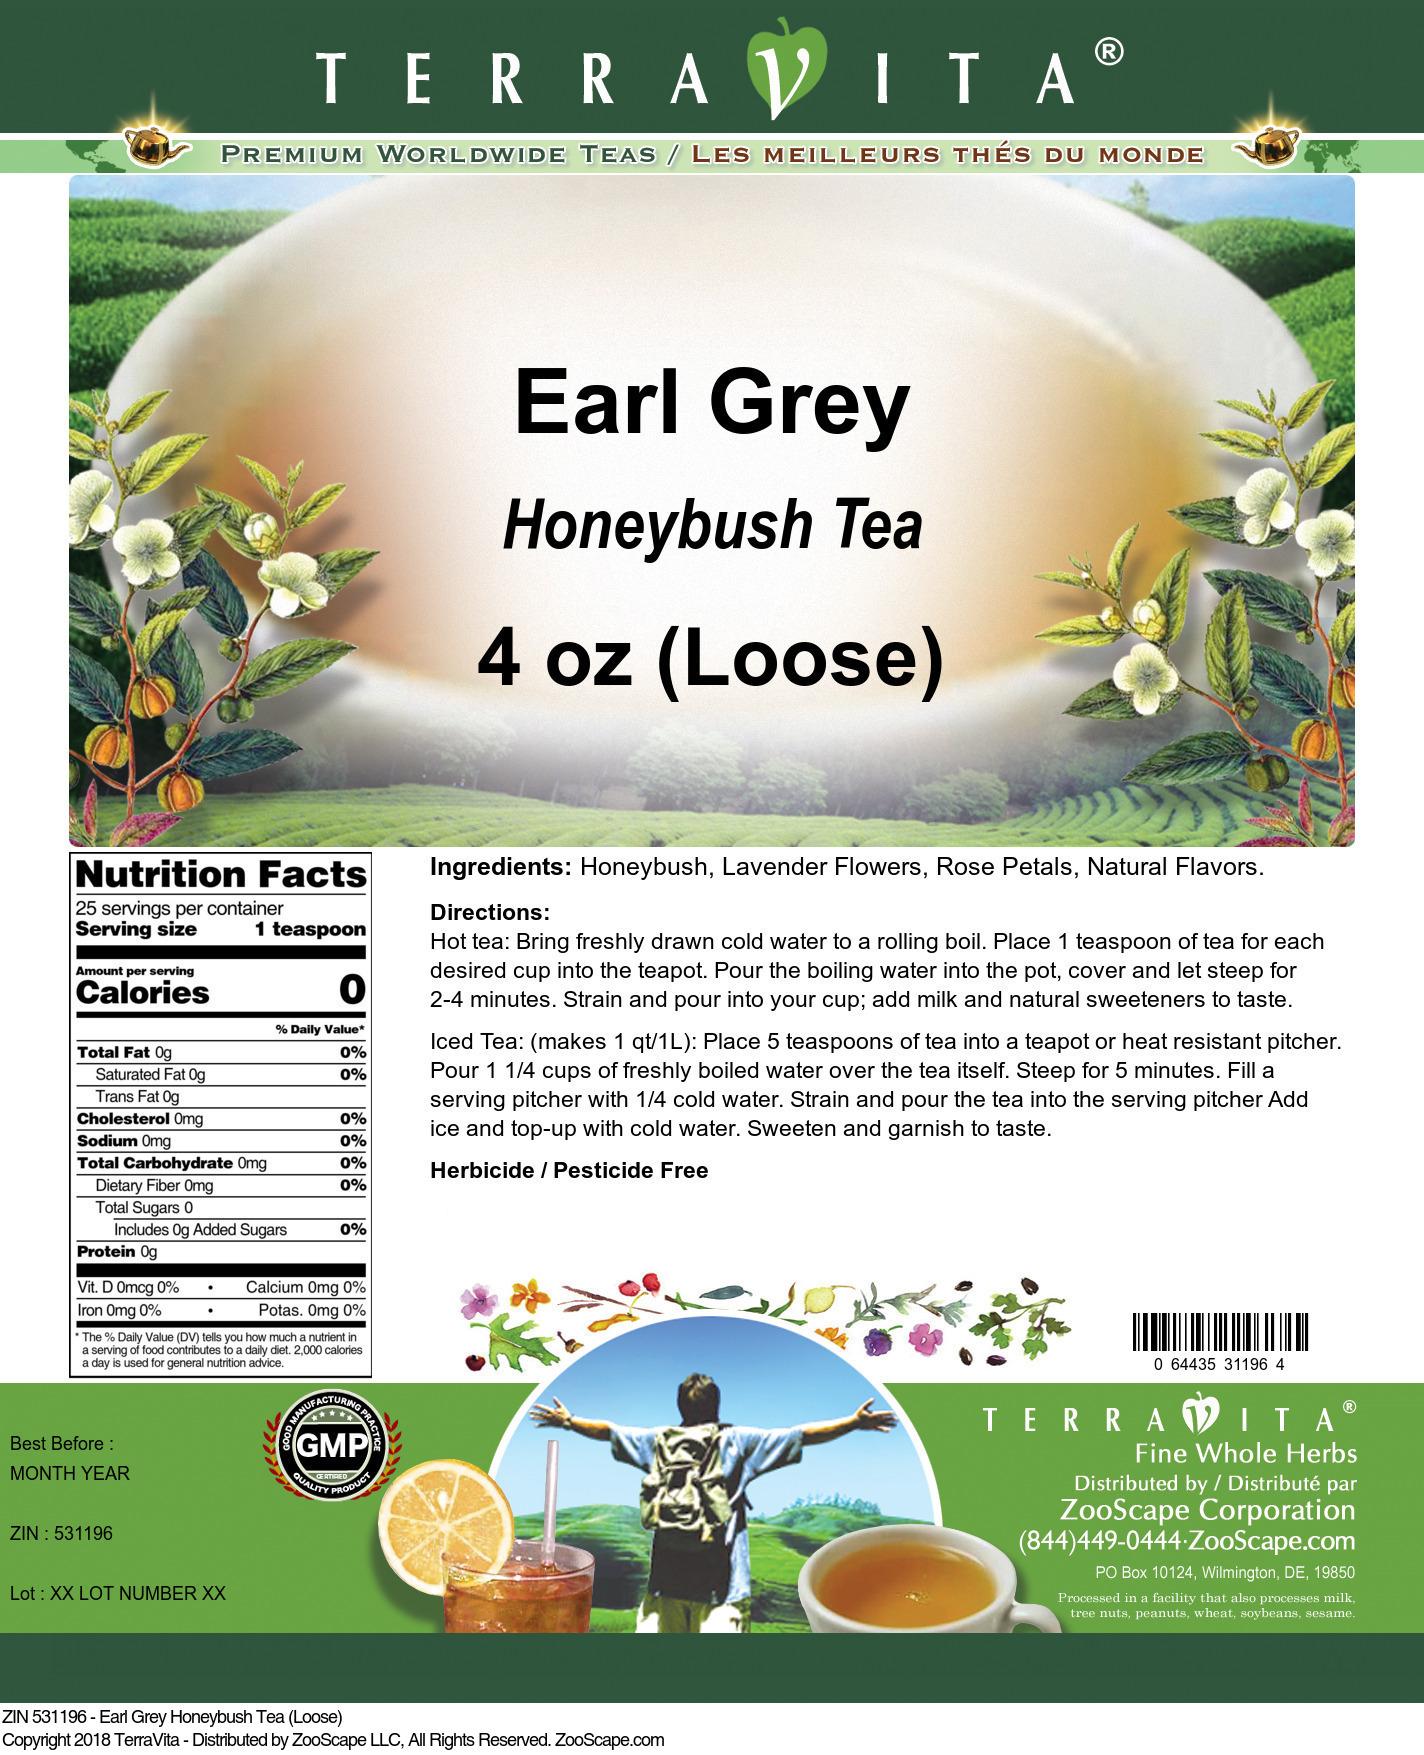 Earl Grey Honeybush Tea (Loose)